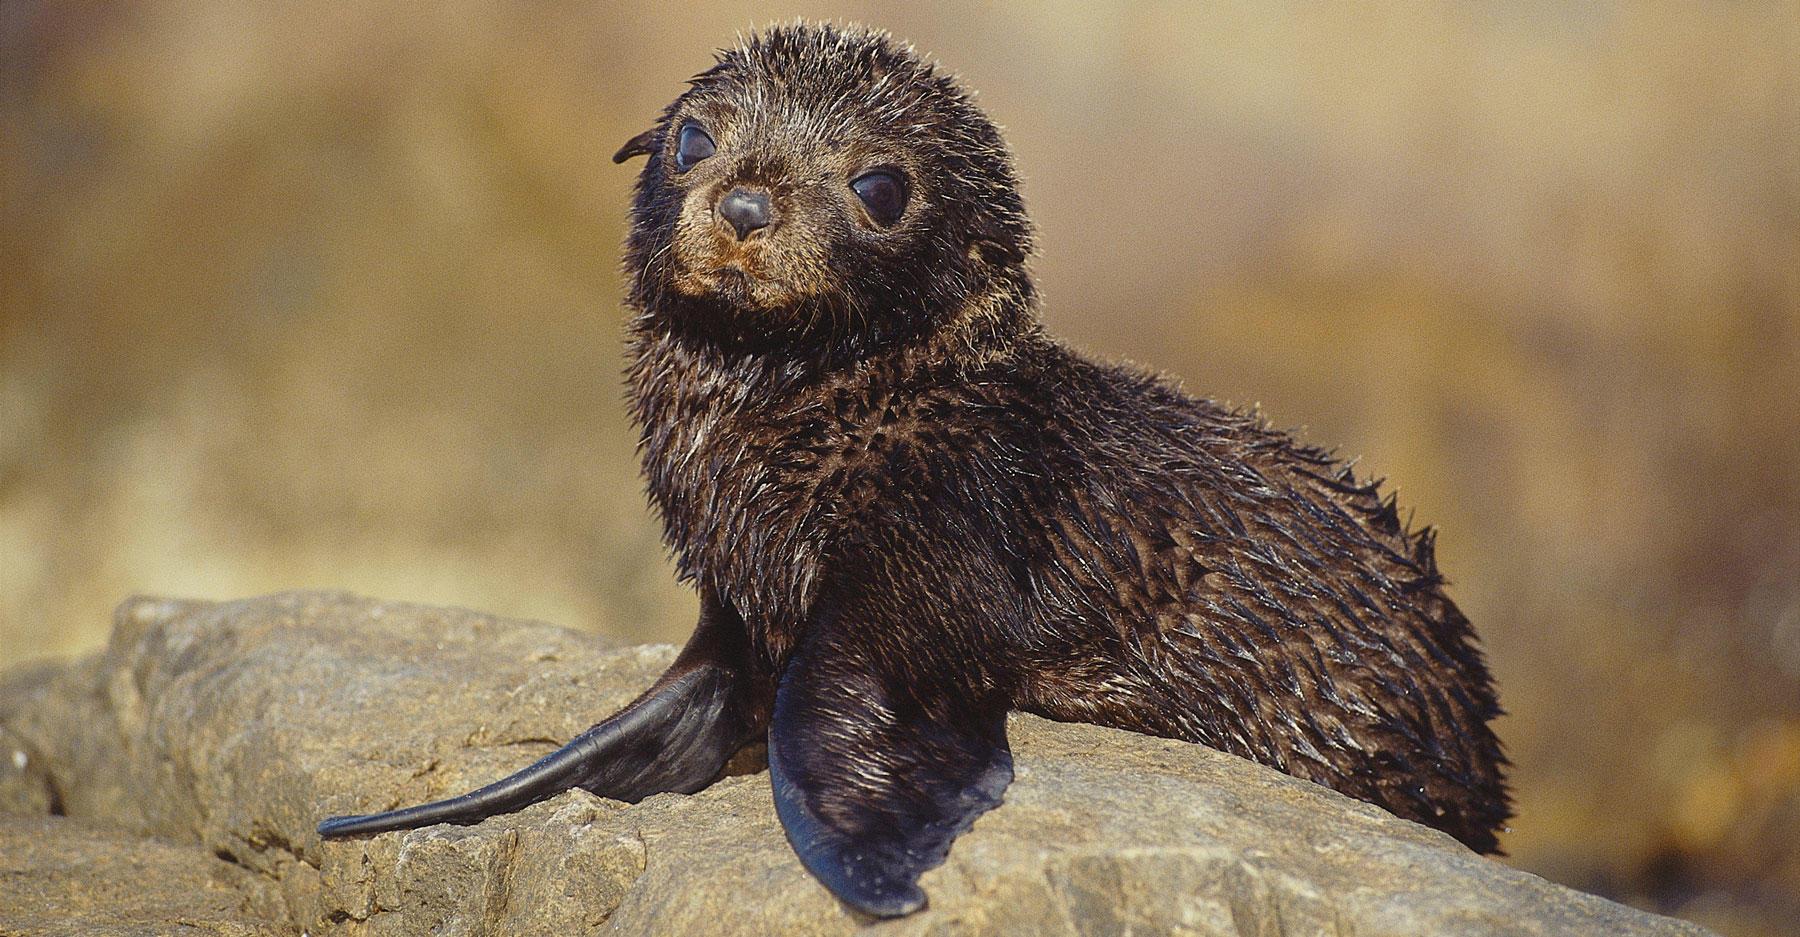 Pup Australian sea lion sits on rock